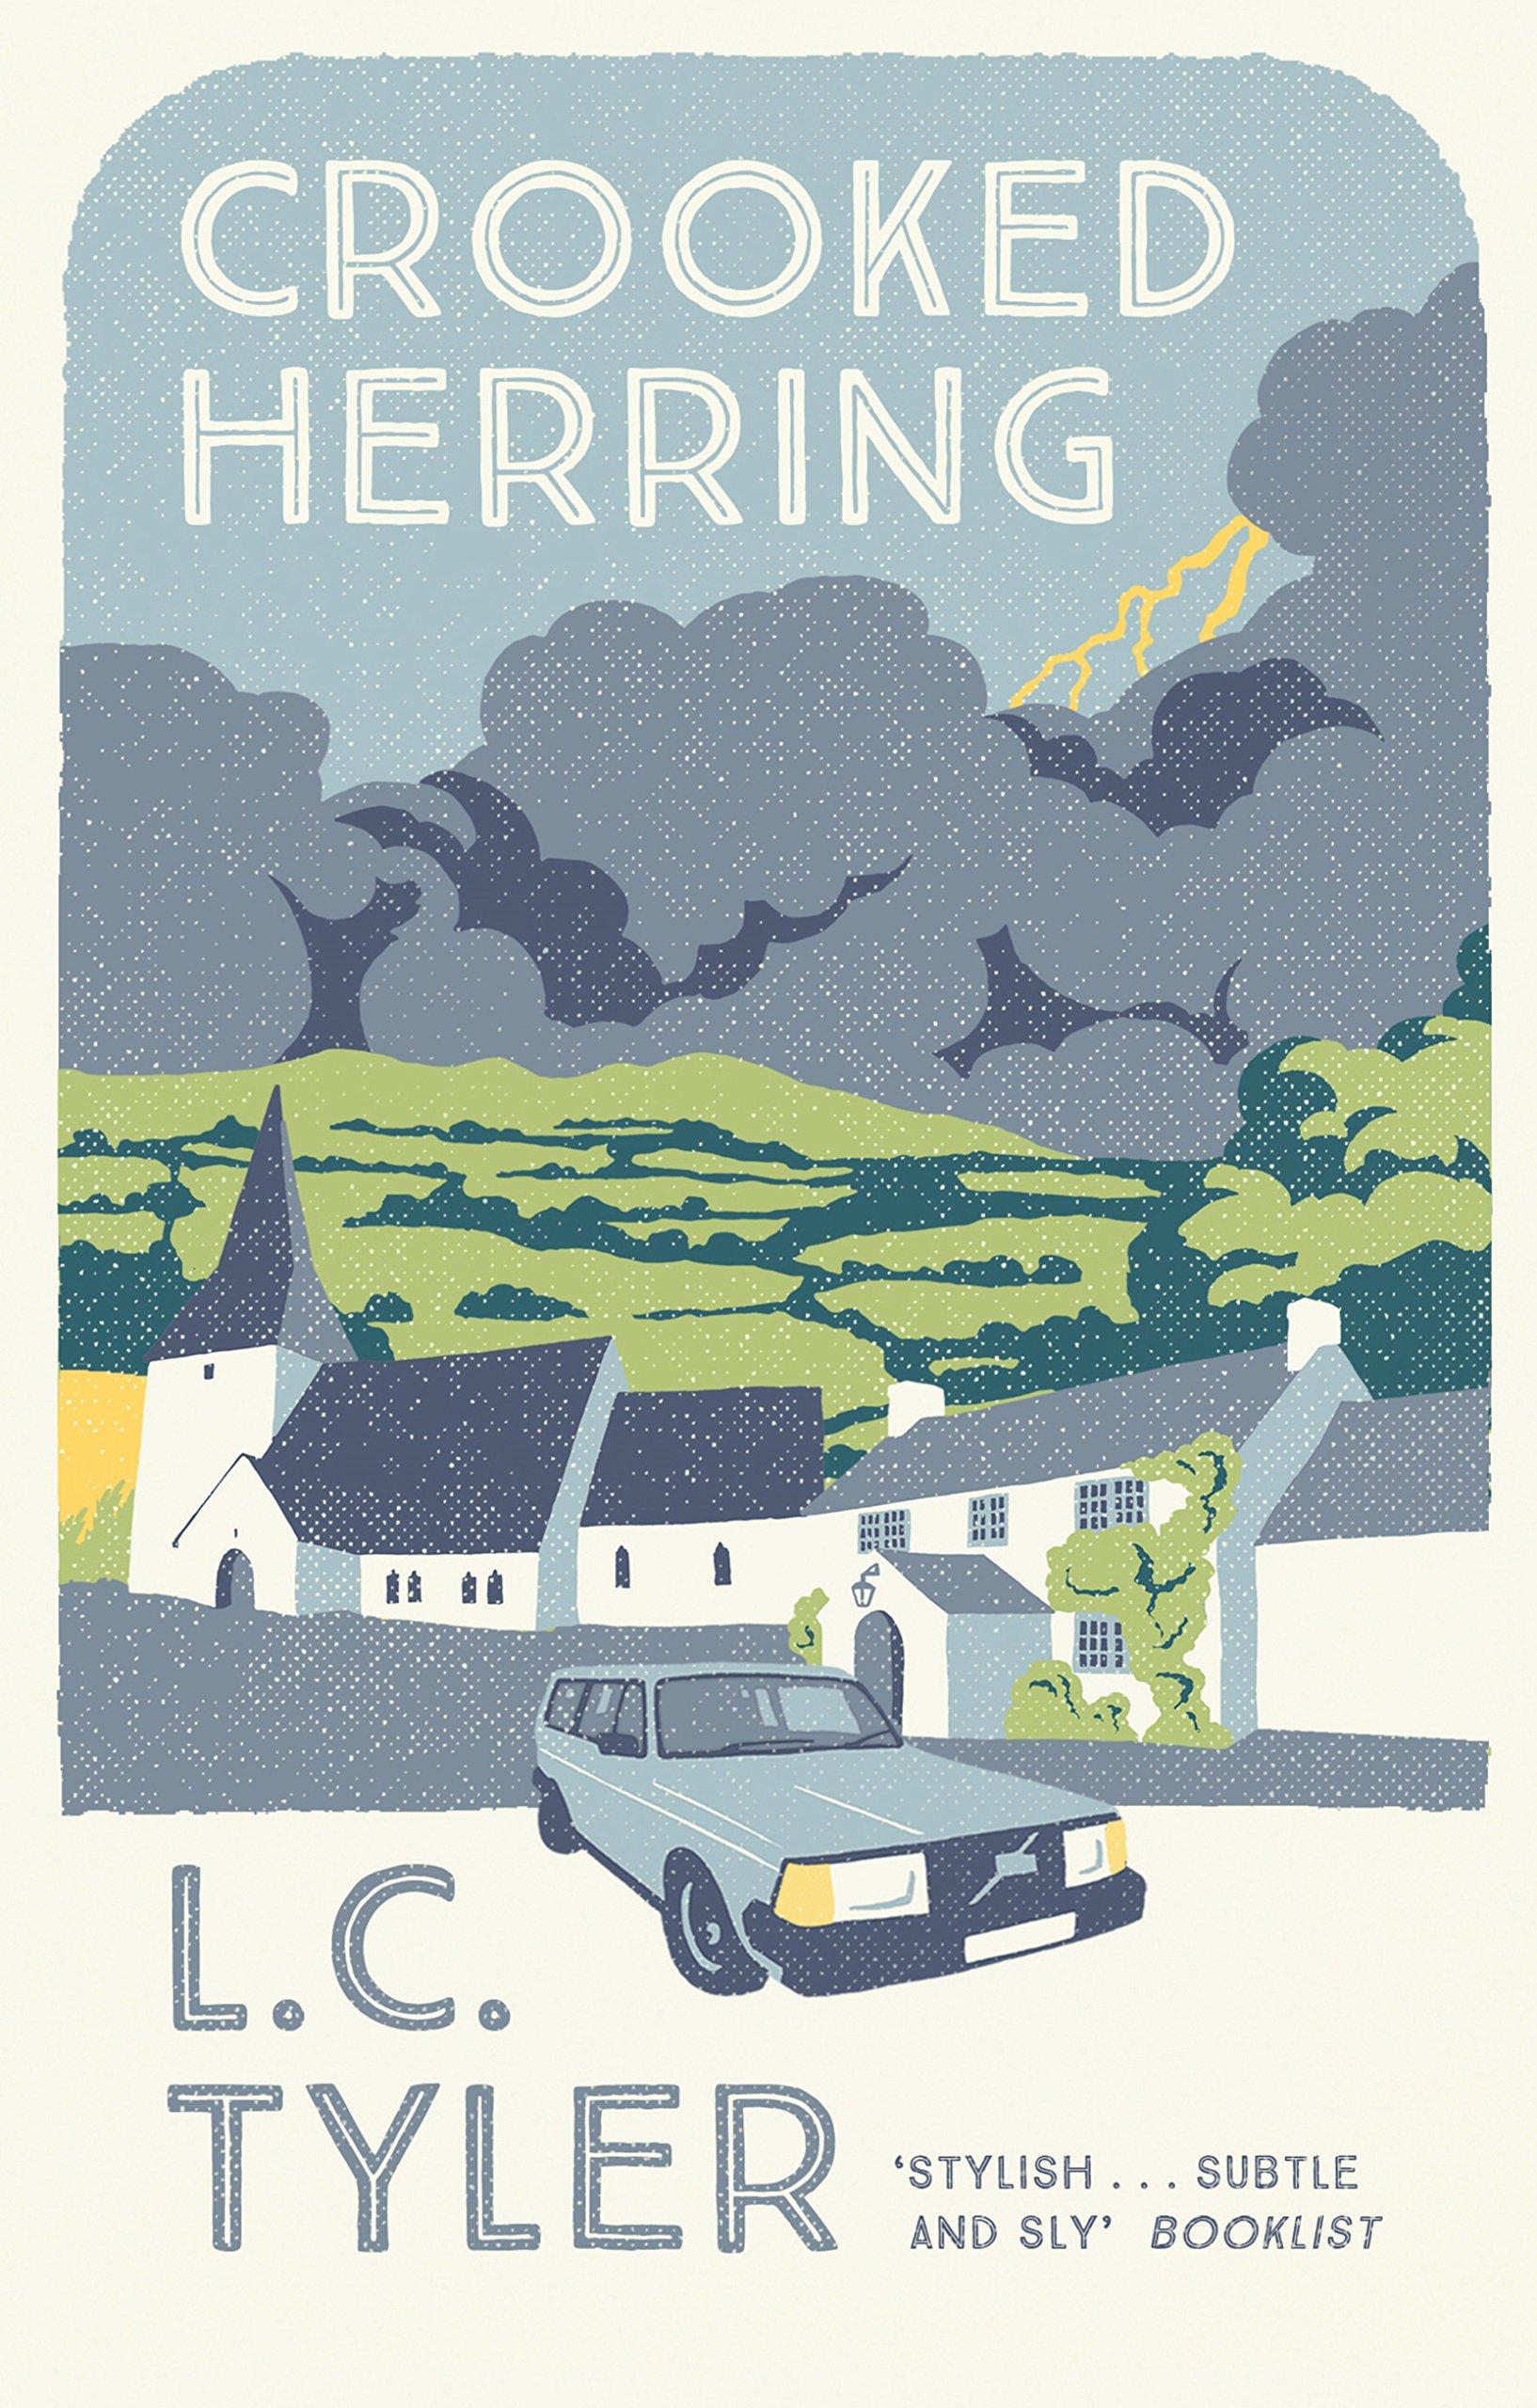 Crooked Herring (Herring Mysteries): Amazon.co.uk: Tyler, L C ...